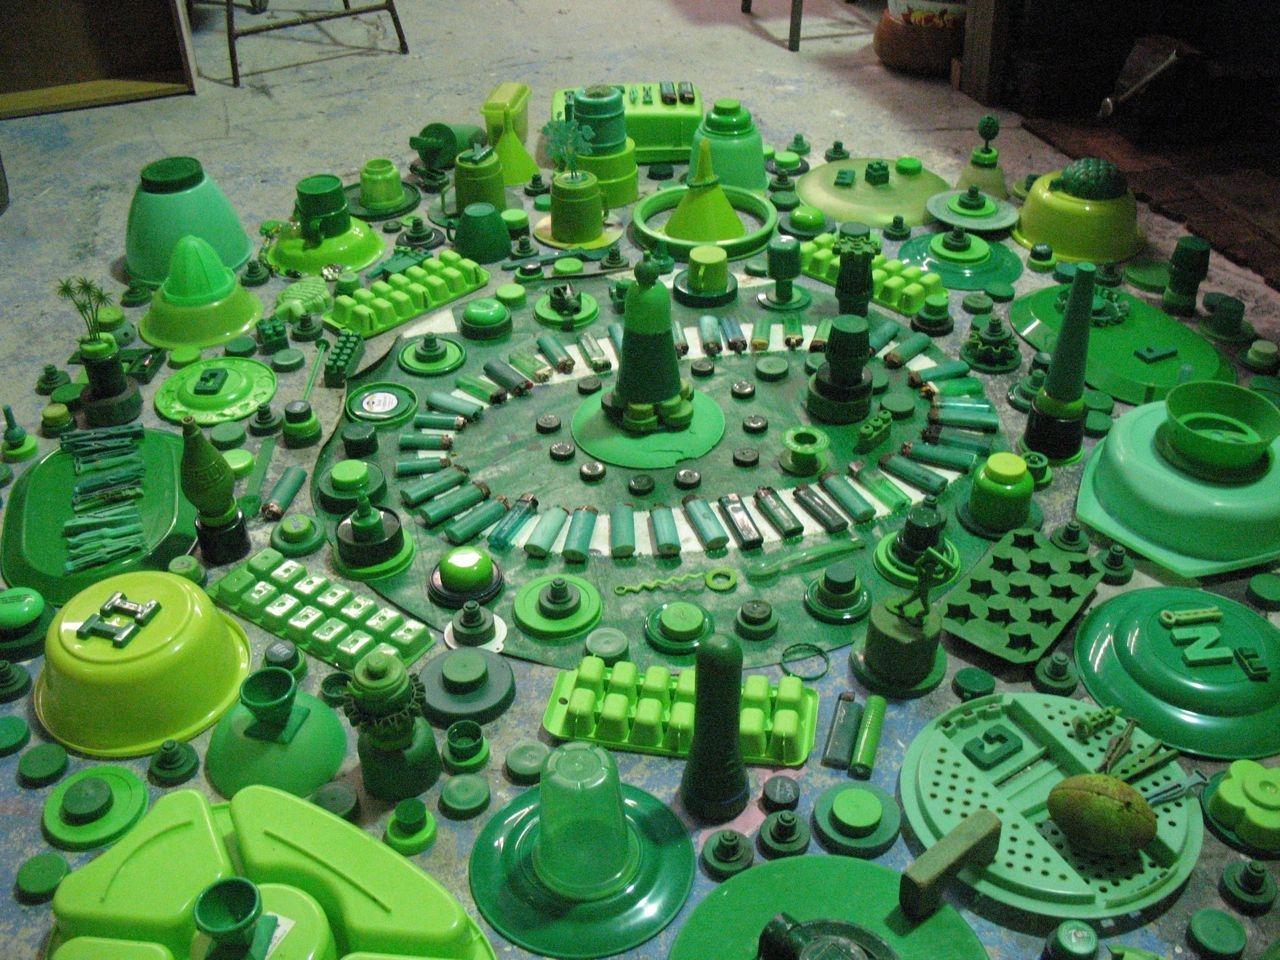 Study [green] image